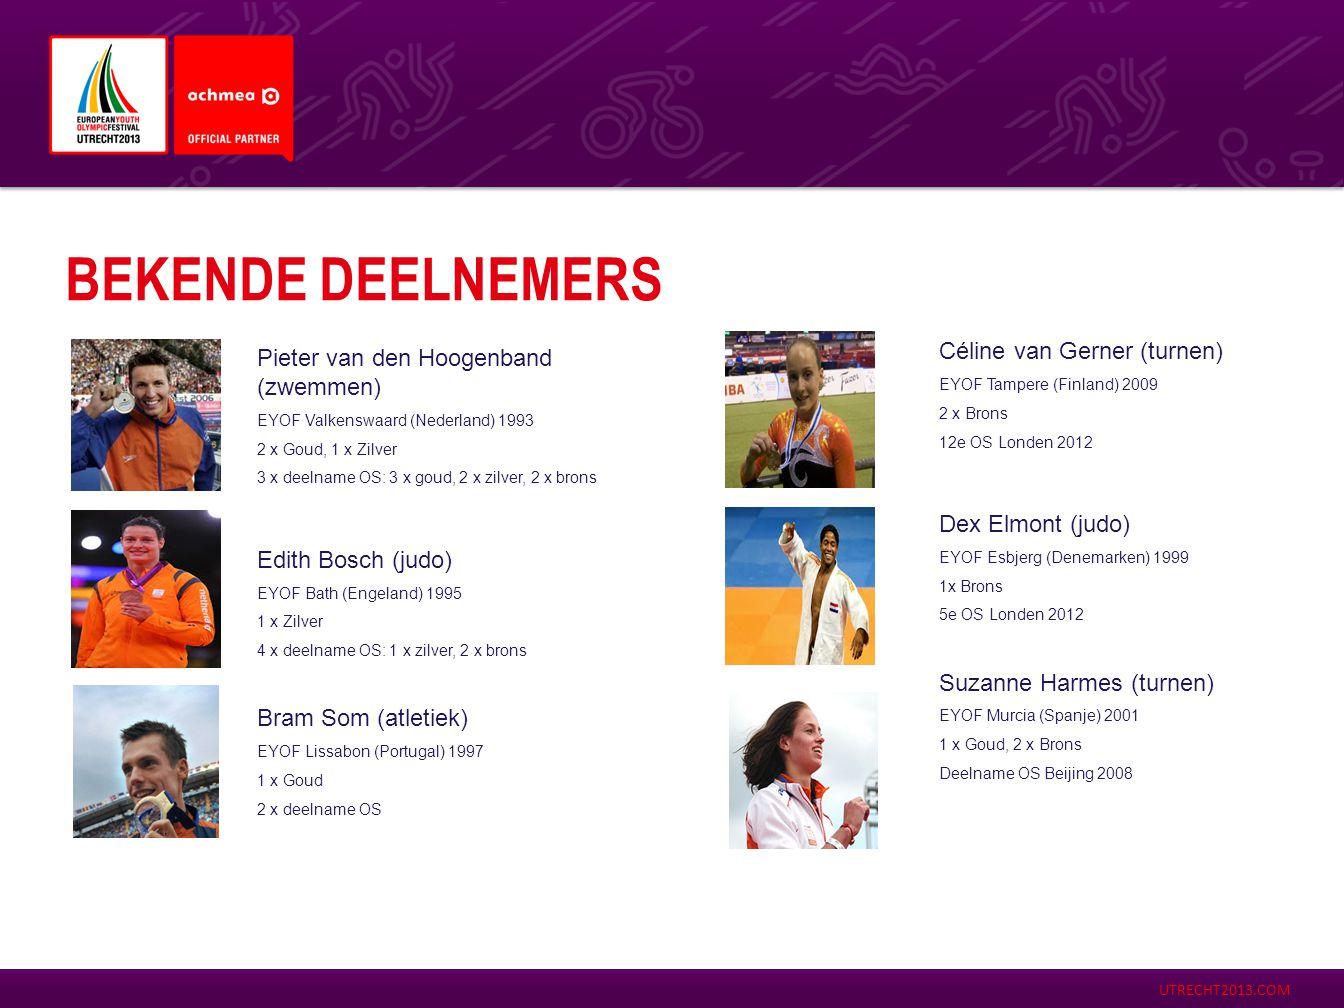 BEKENDE DEELNEMERS Céline van Gerner (turnen)